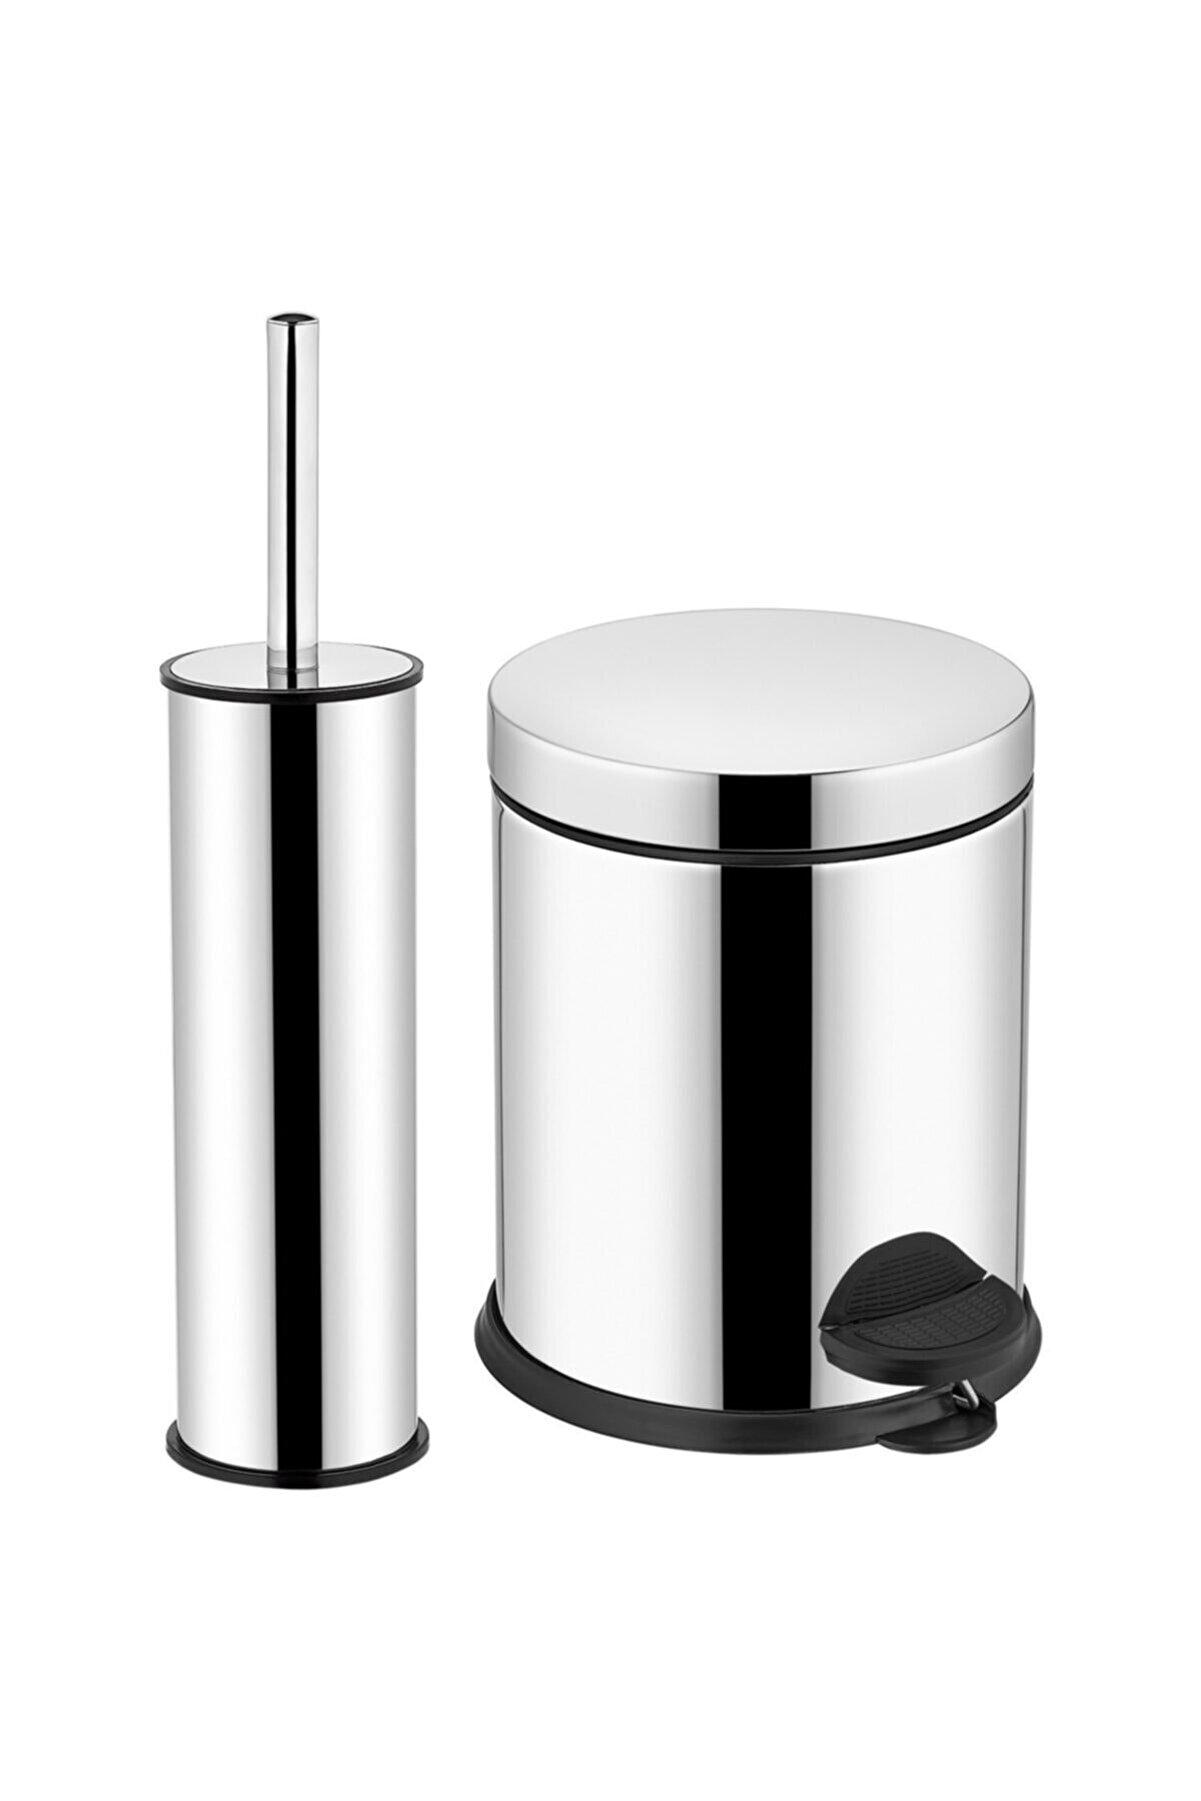 Sas Pedallı Çöp Kovası Wc Klozet Tuvalet Fırça Seti Banyo Çöp Kovası 3 Lt Krom 2'li Banyo Seti